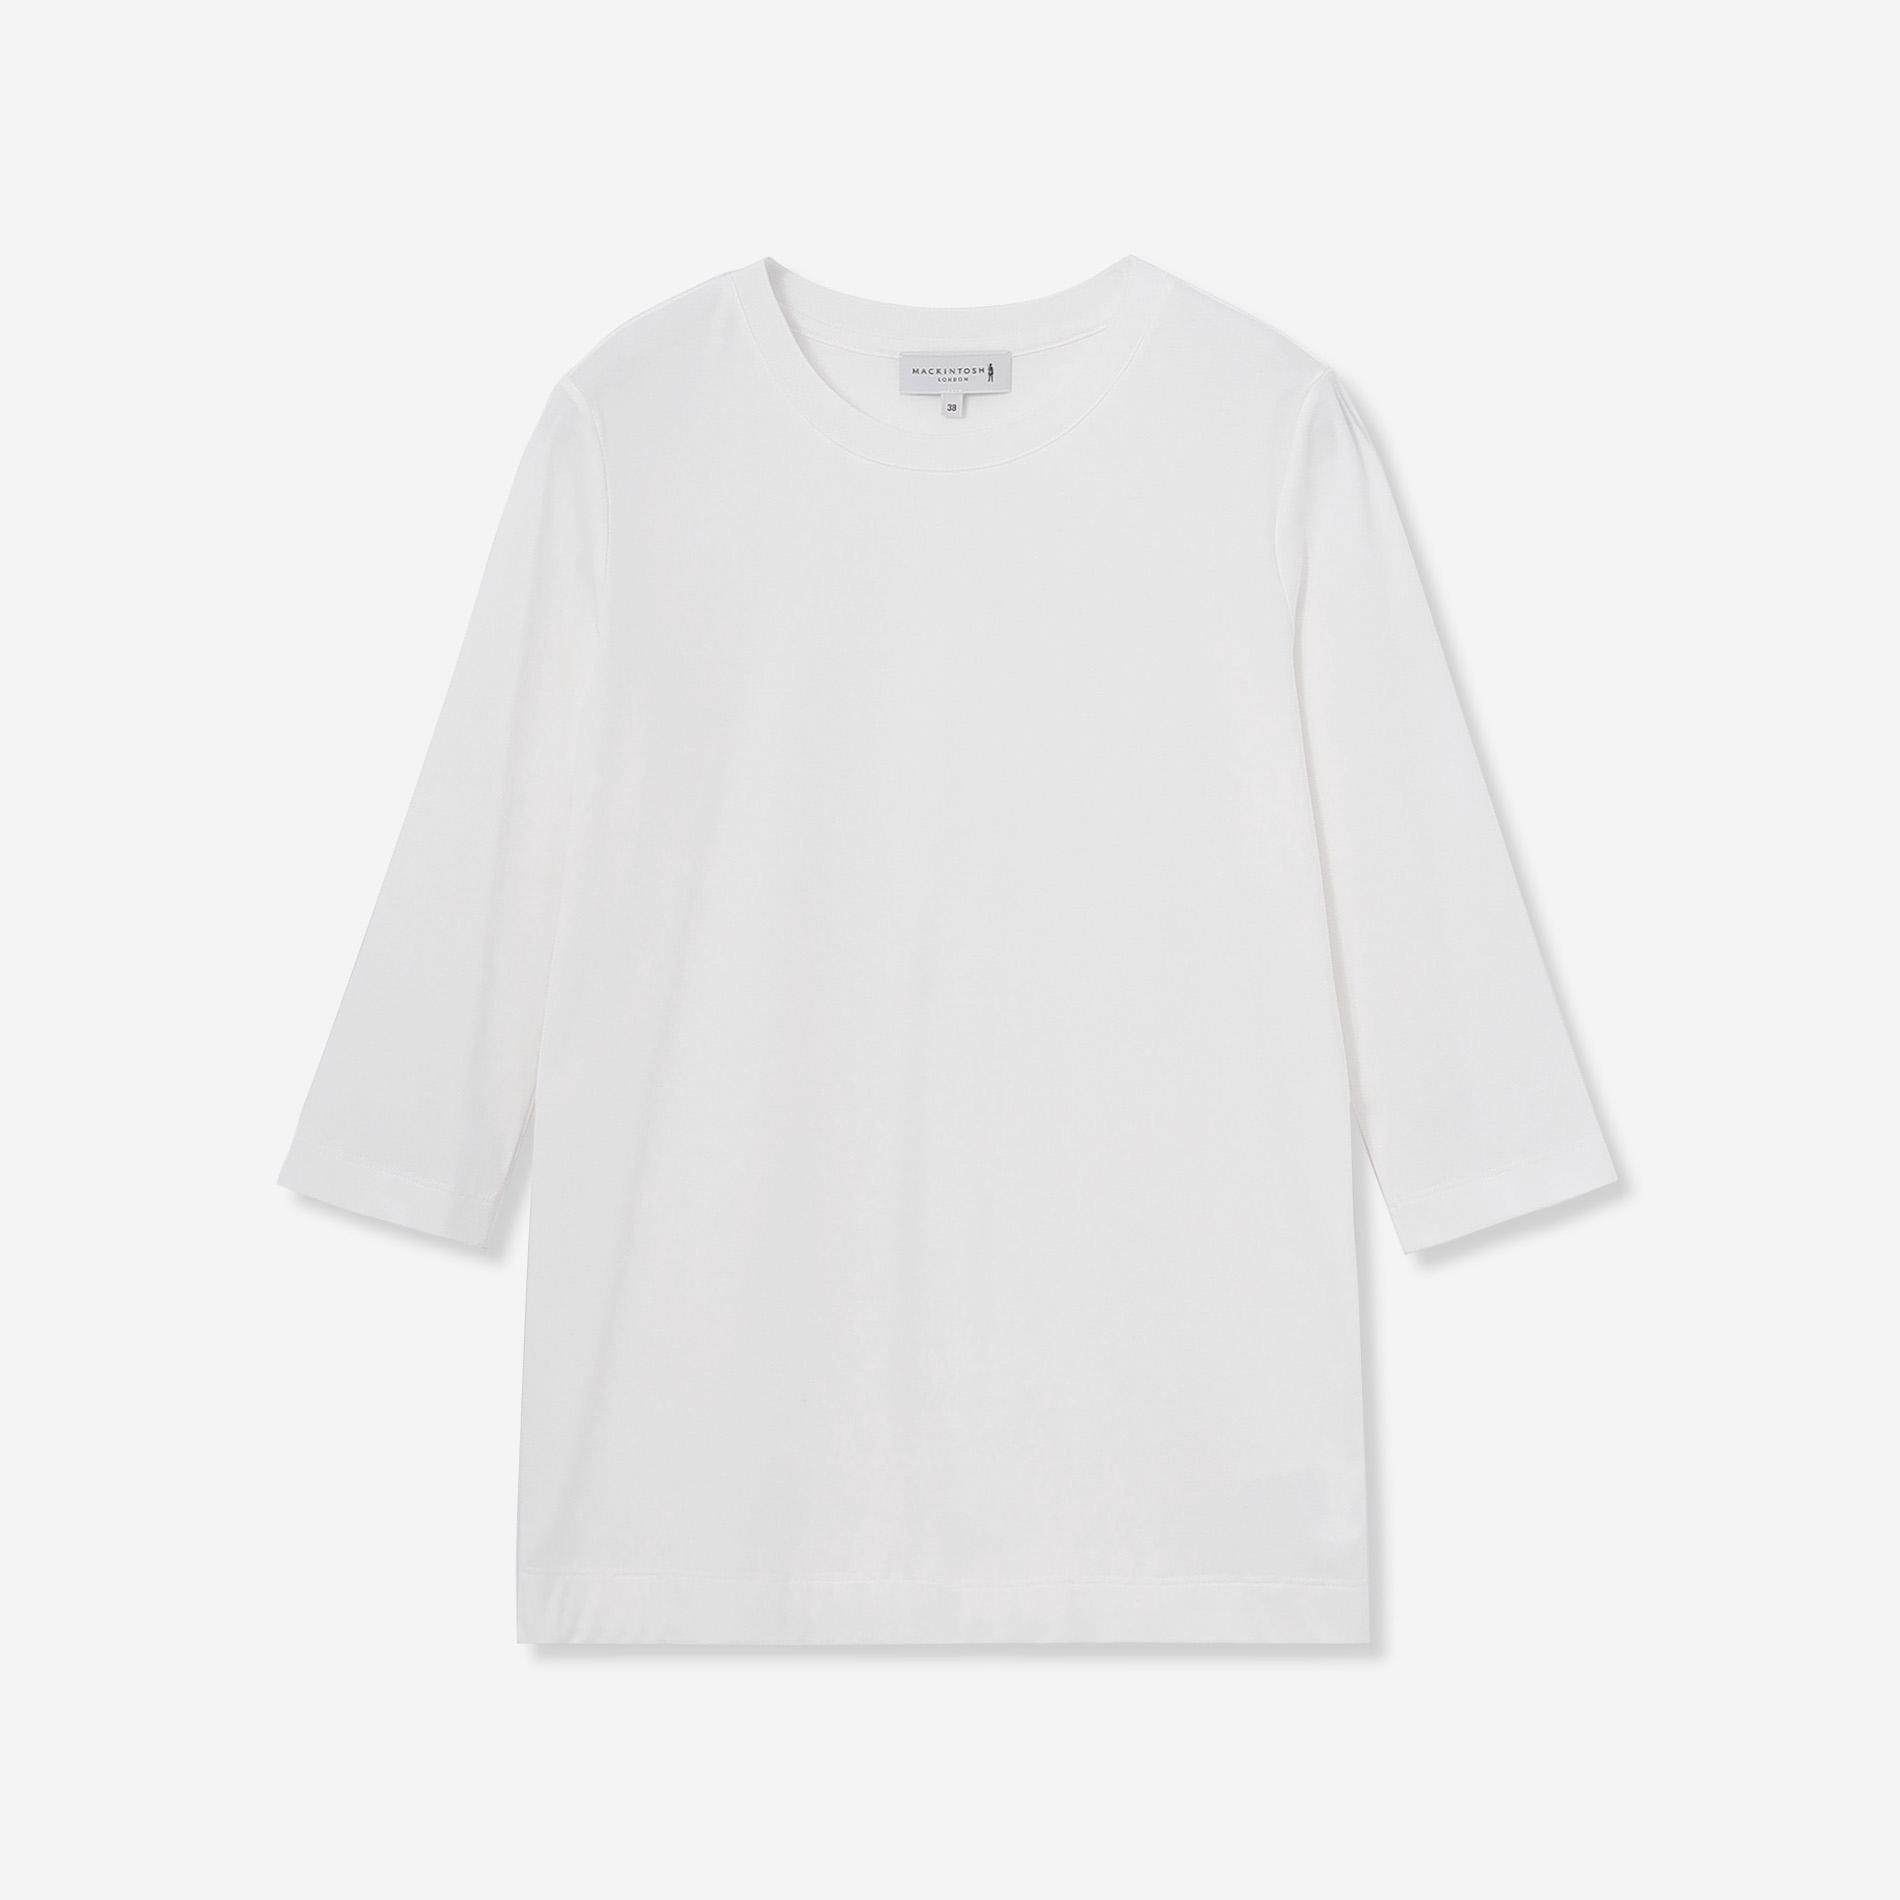 【SUPER FINE LAB.】パウダーシュガーコットン五分袖Tシャツ